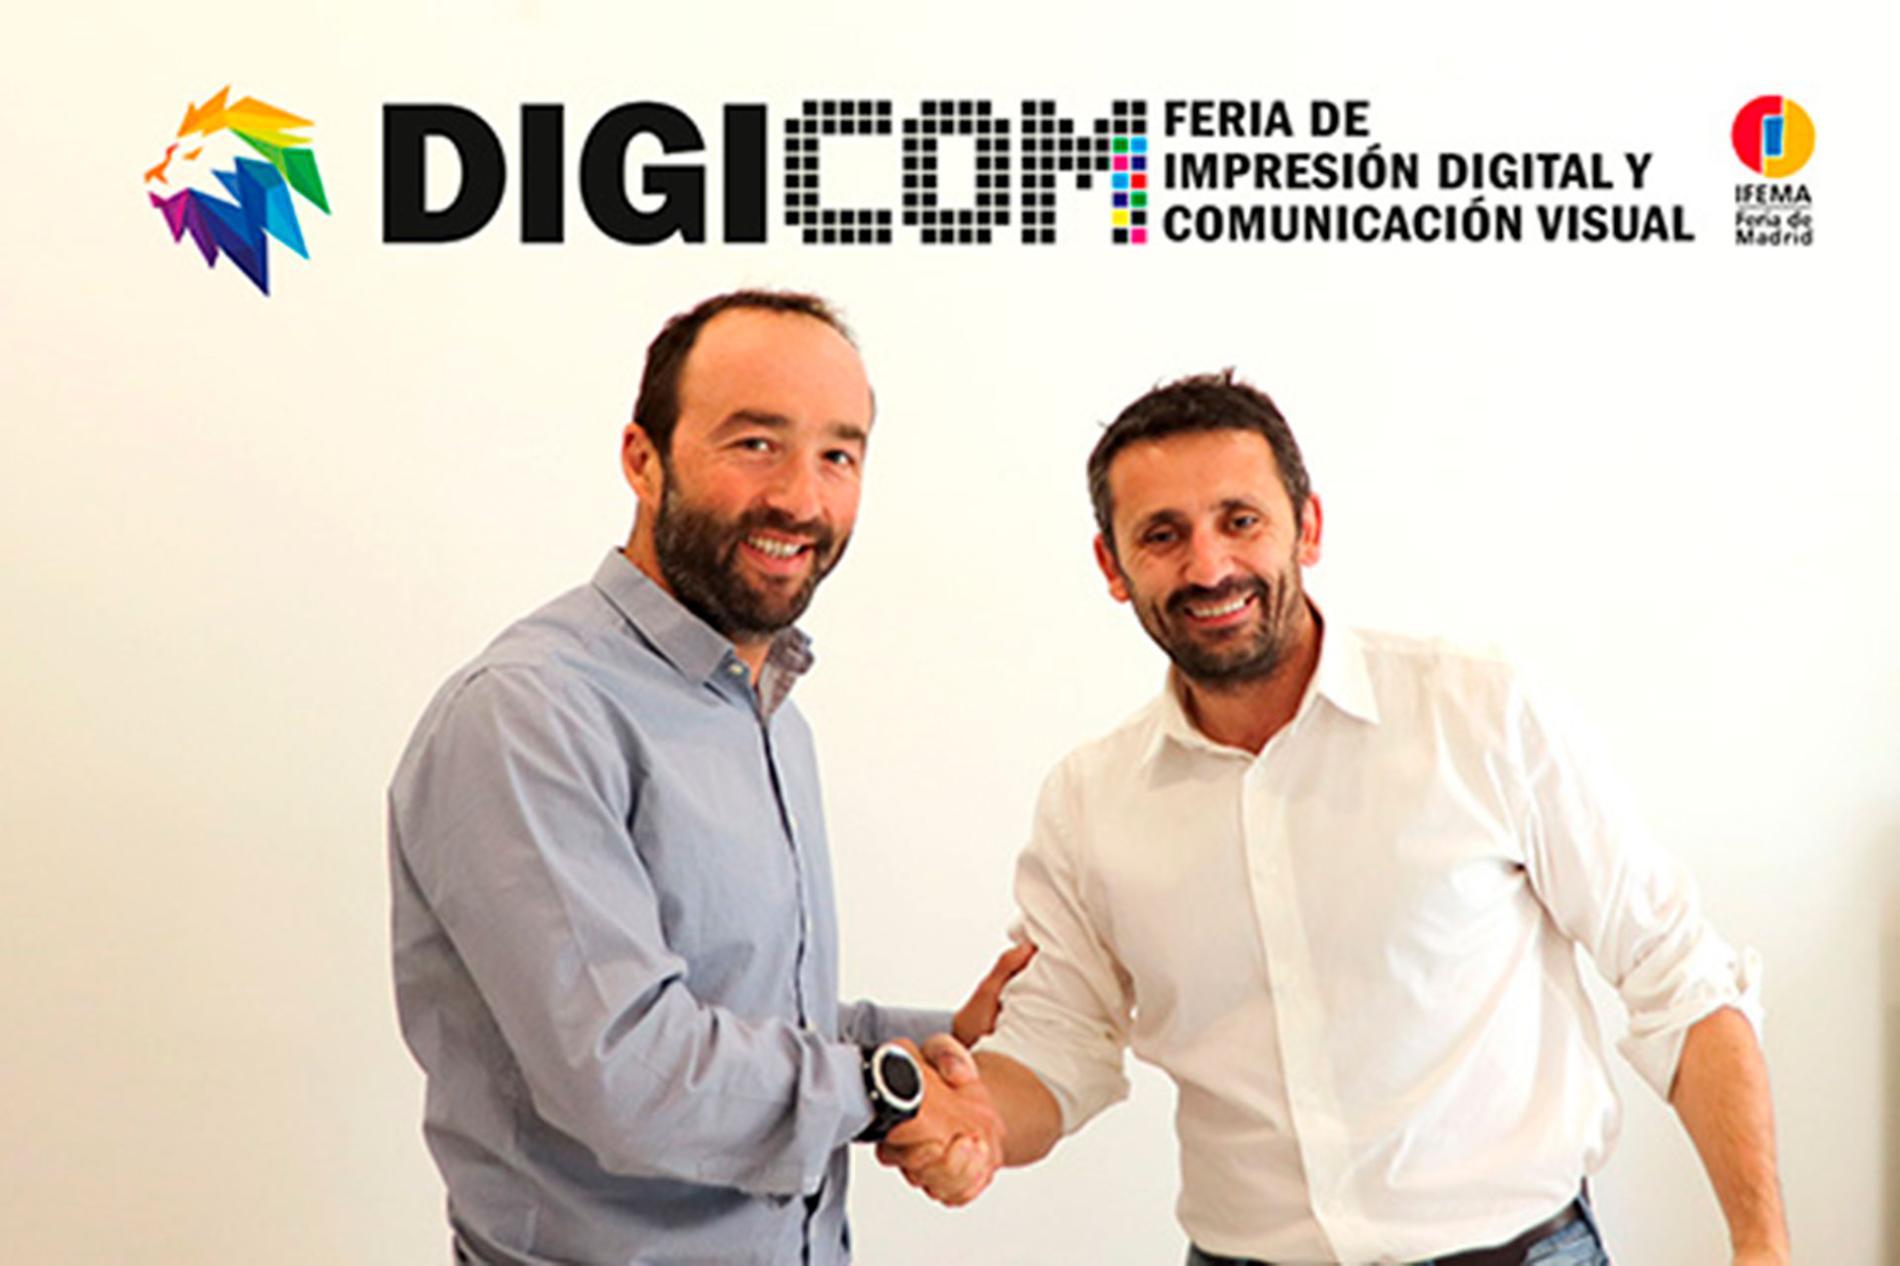 Acuerdo entre Digicom y Premios Emporia